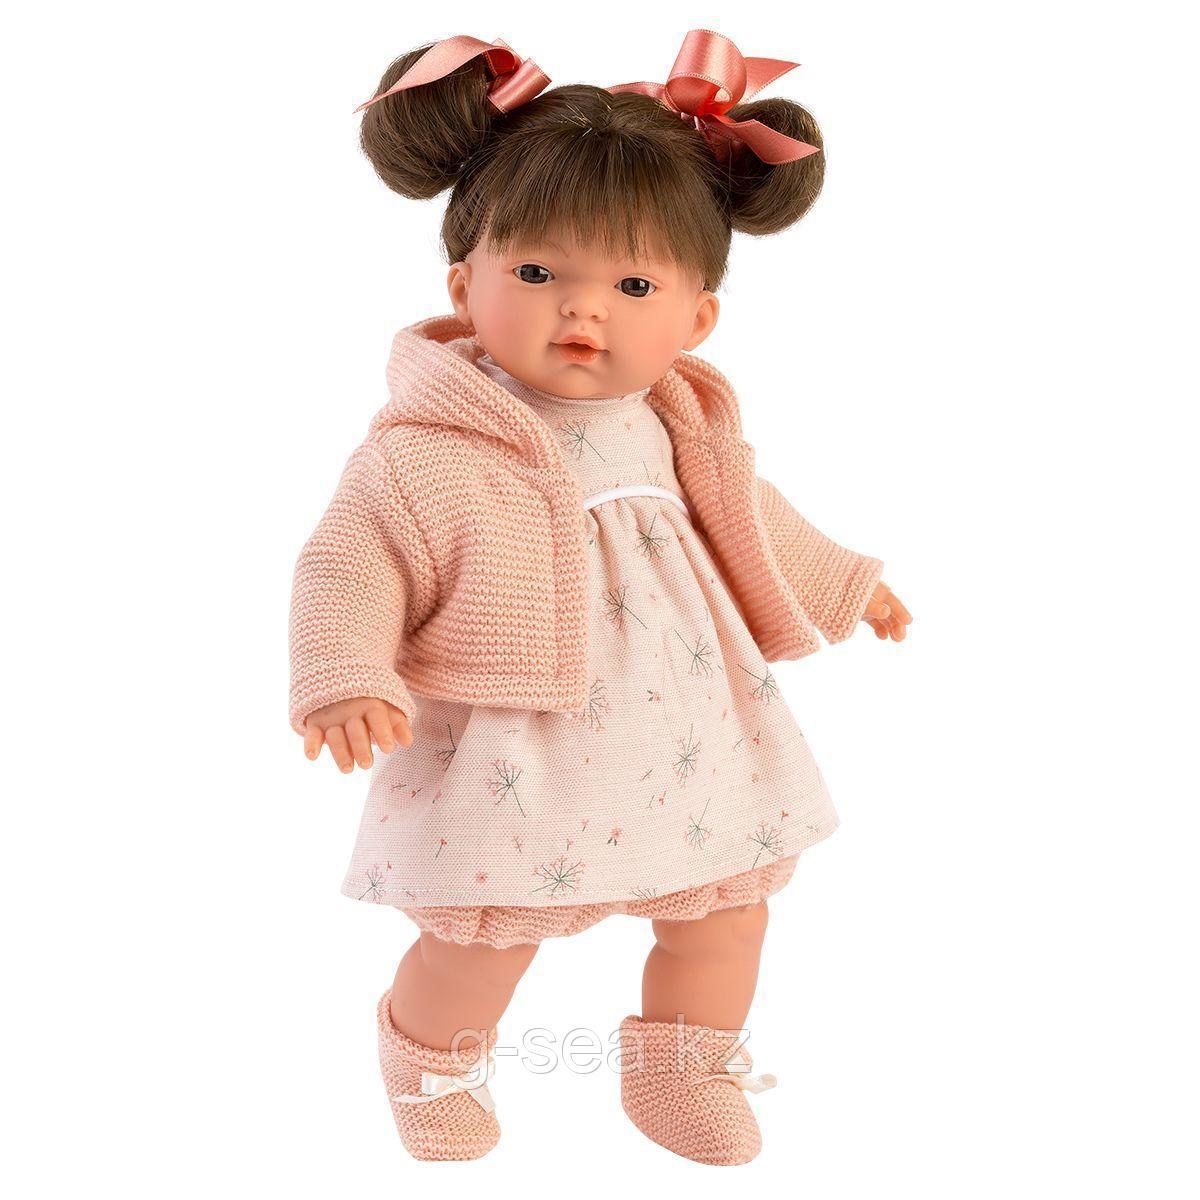 LLORENS: Кукла Рита 33 см., брюнетка в розовом жакете - фото 1